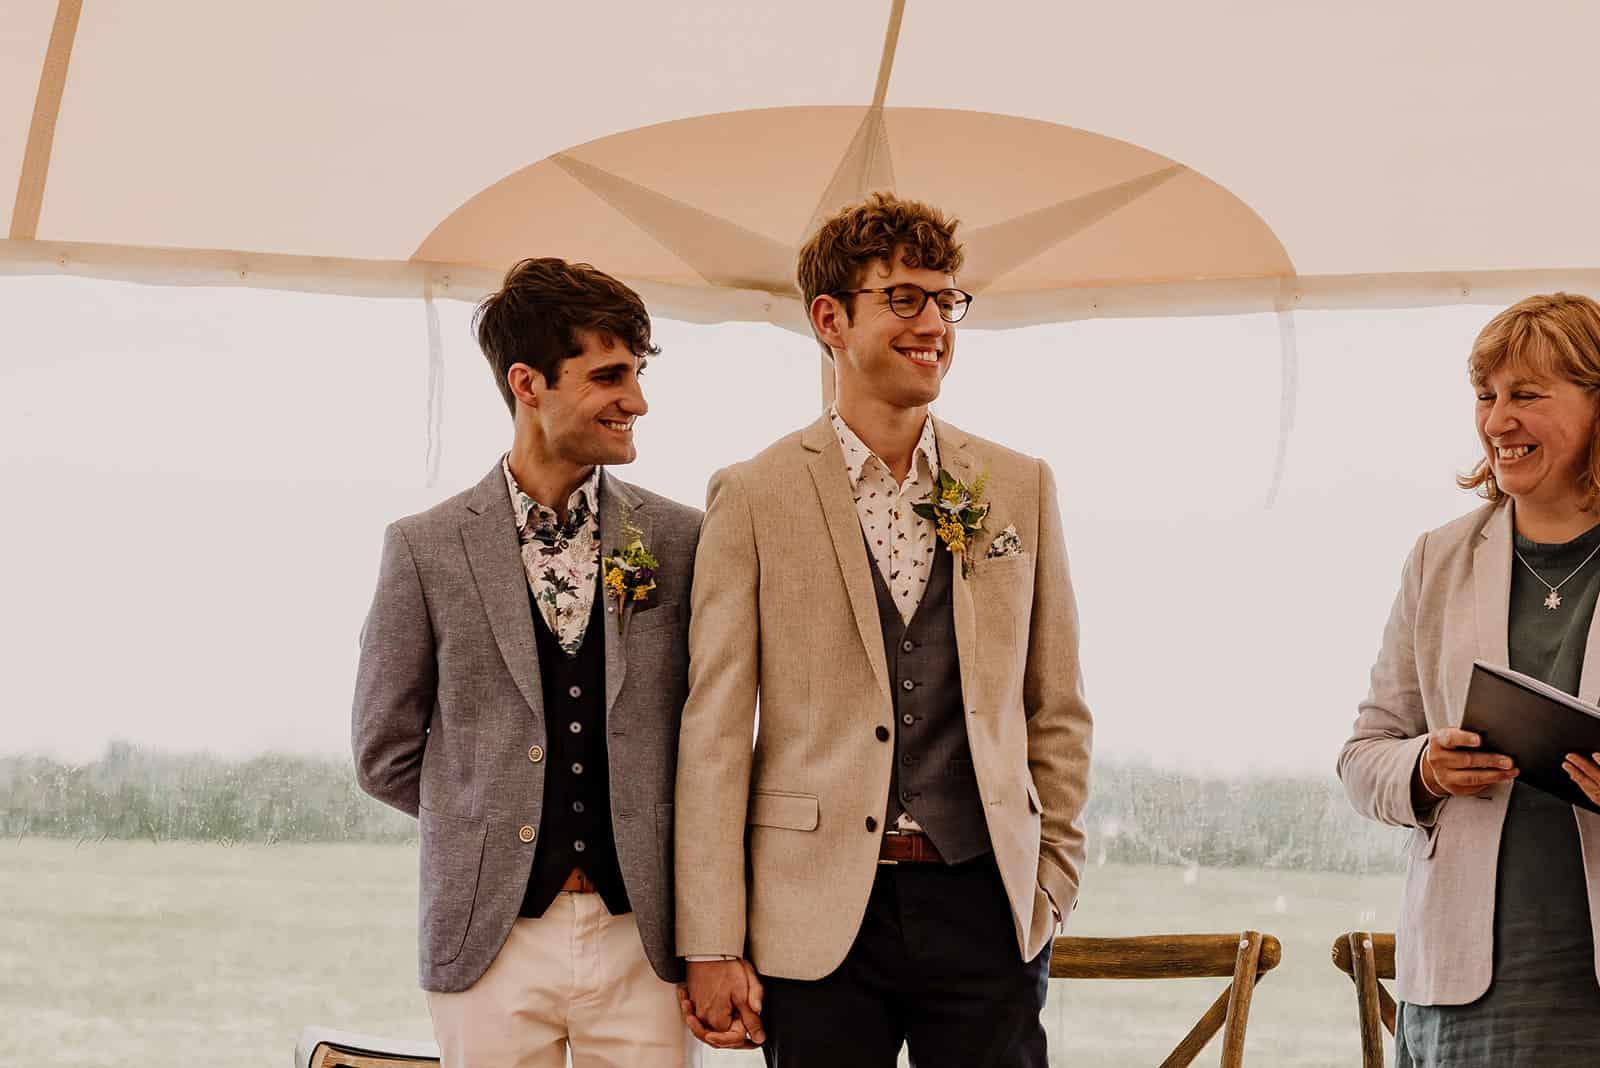 newdowns-farm-wedding-ceremony-cornish-celebrants-tom-peter-0015